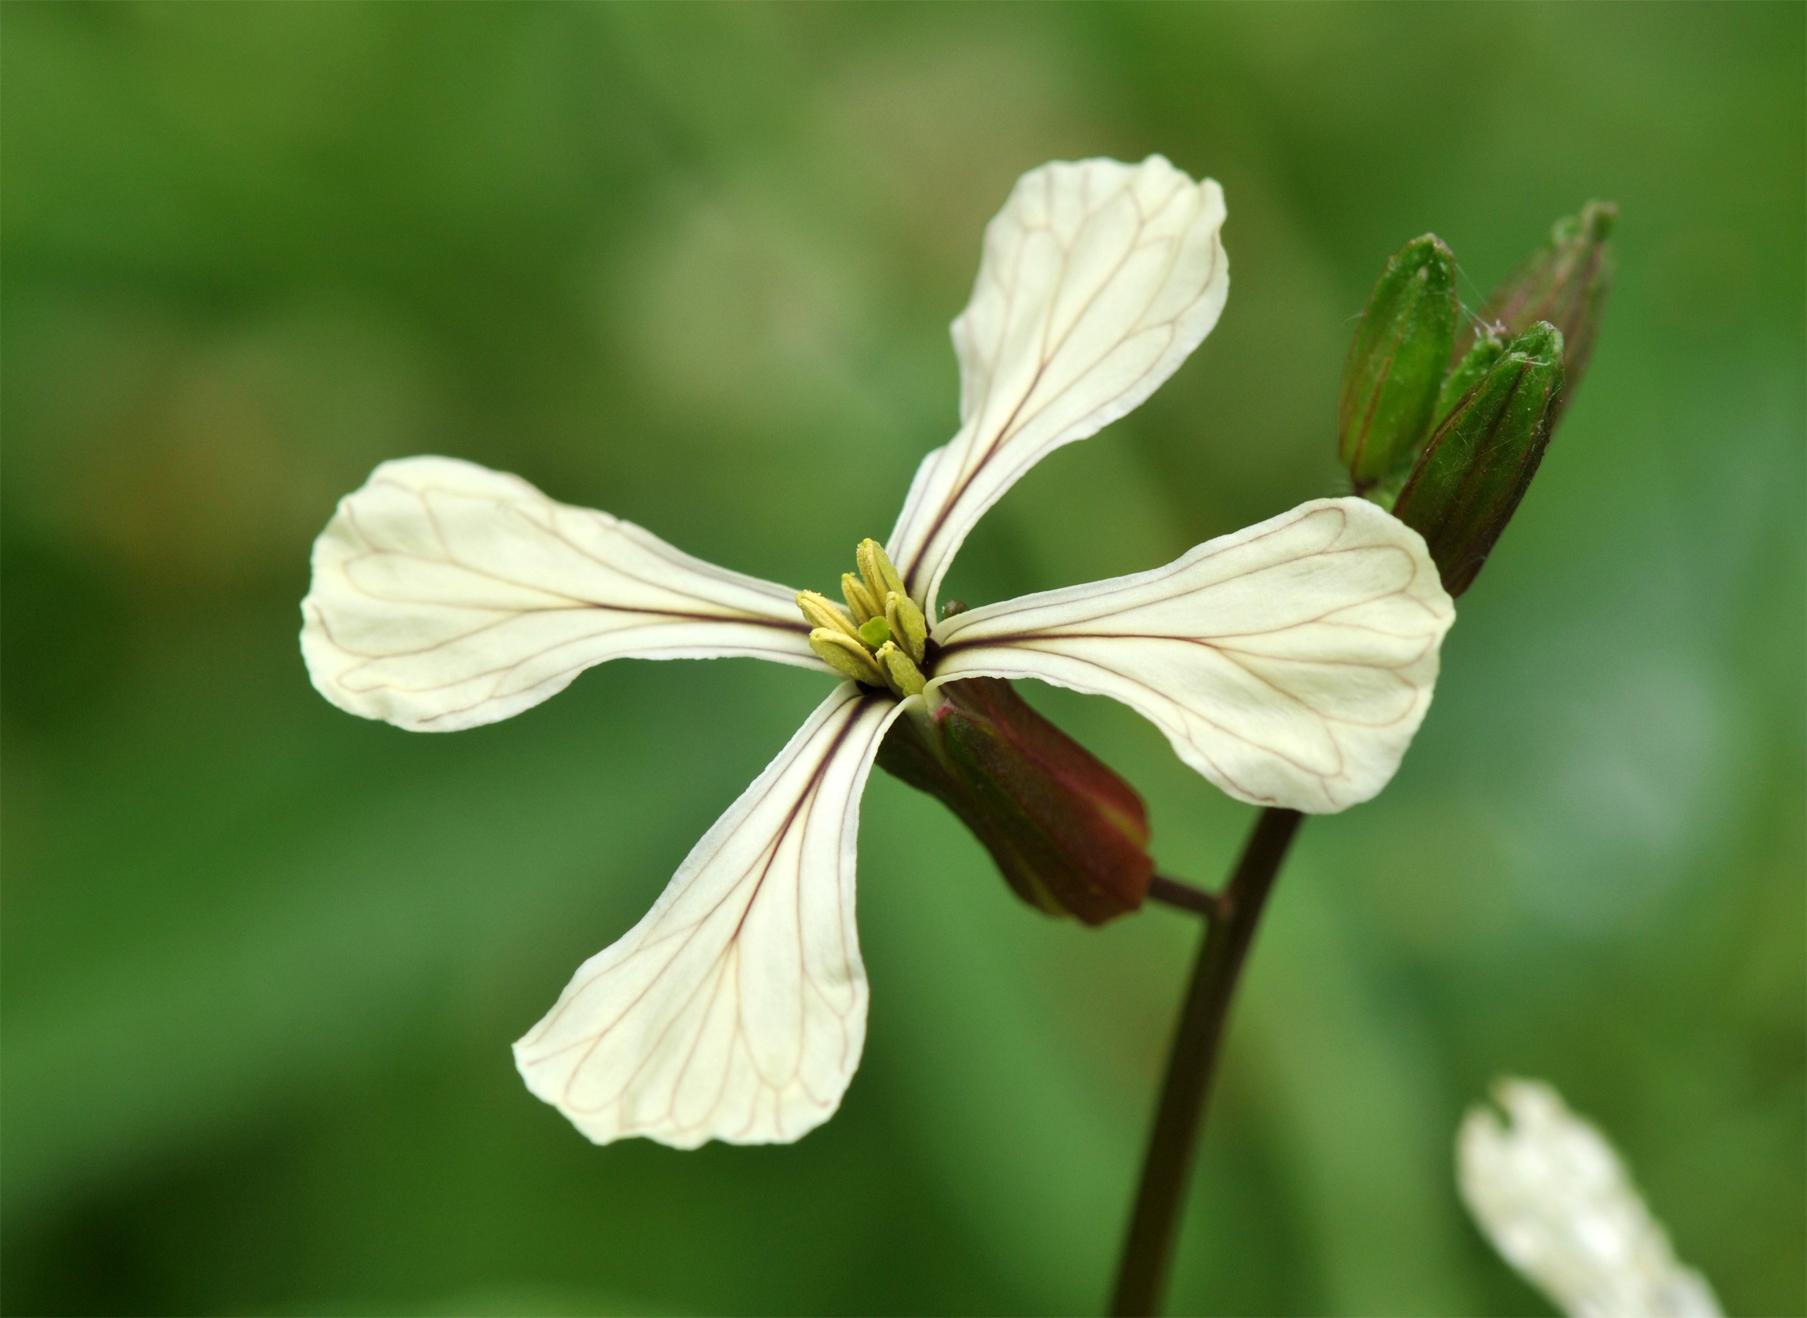 Close-up-flower-of-Arugula